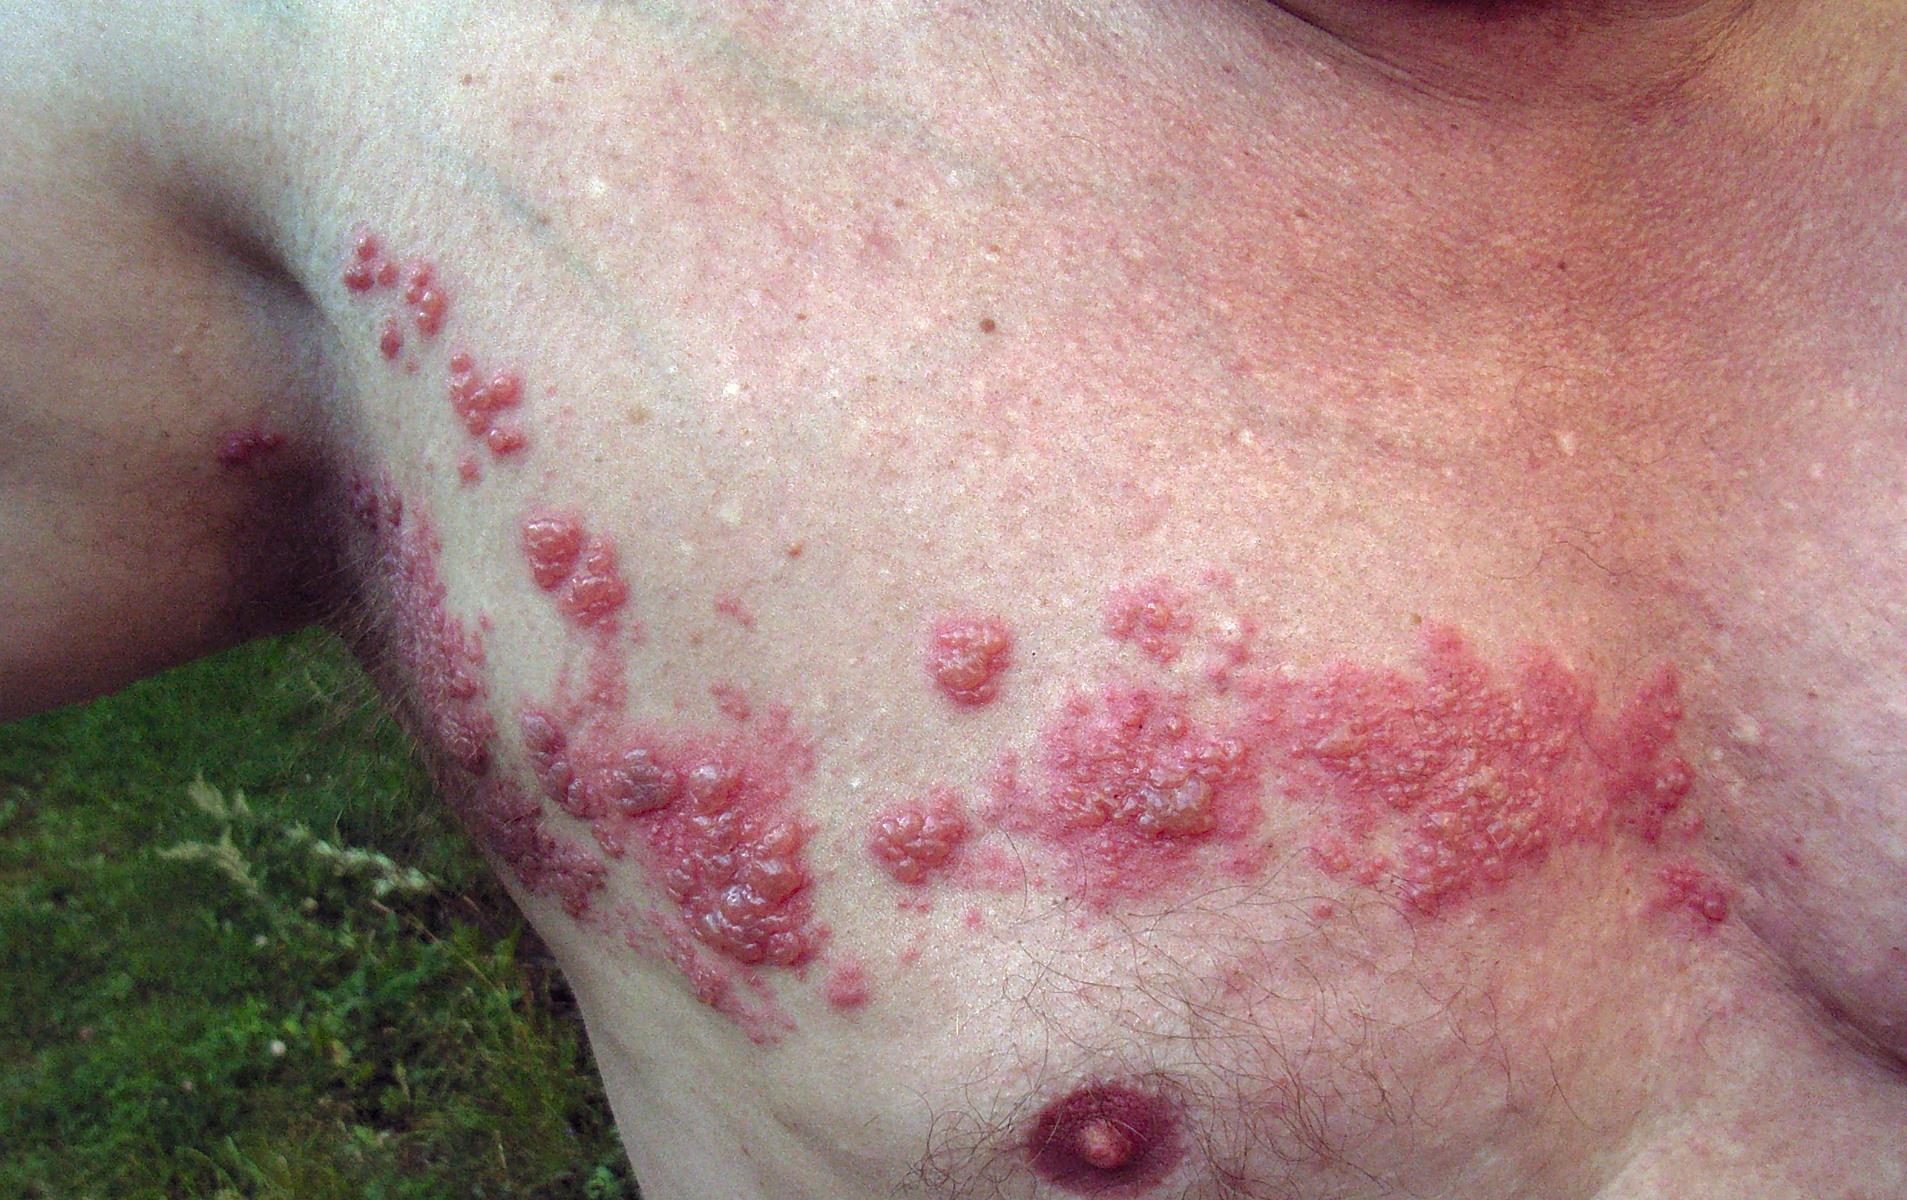 「帯状疱疹」の画像検索結果